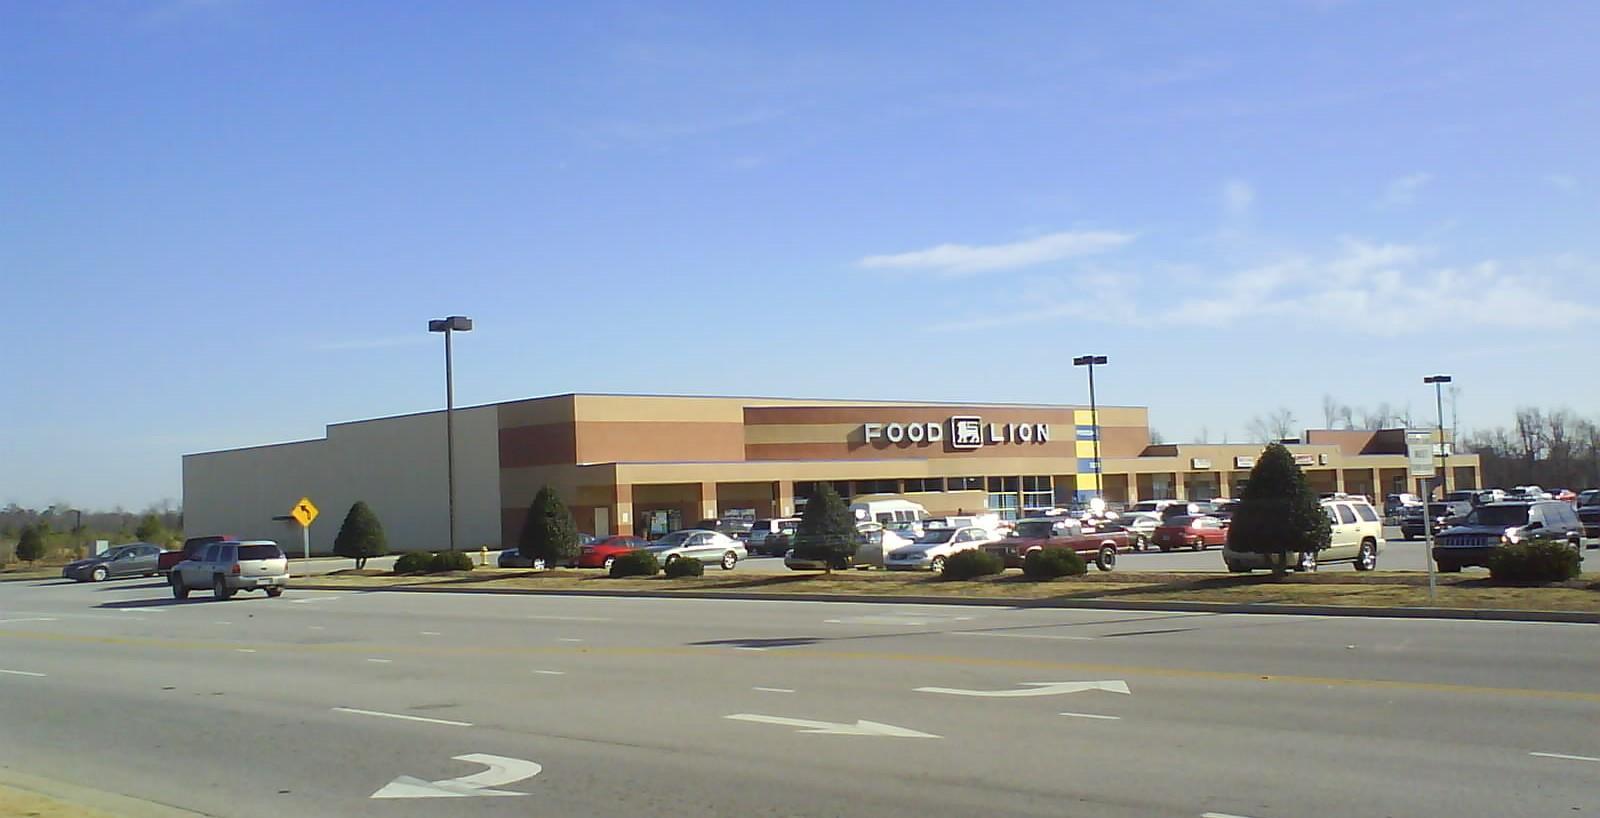 Food lion warehouse dunn nc